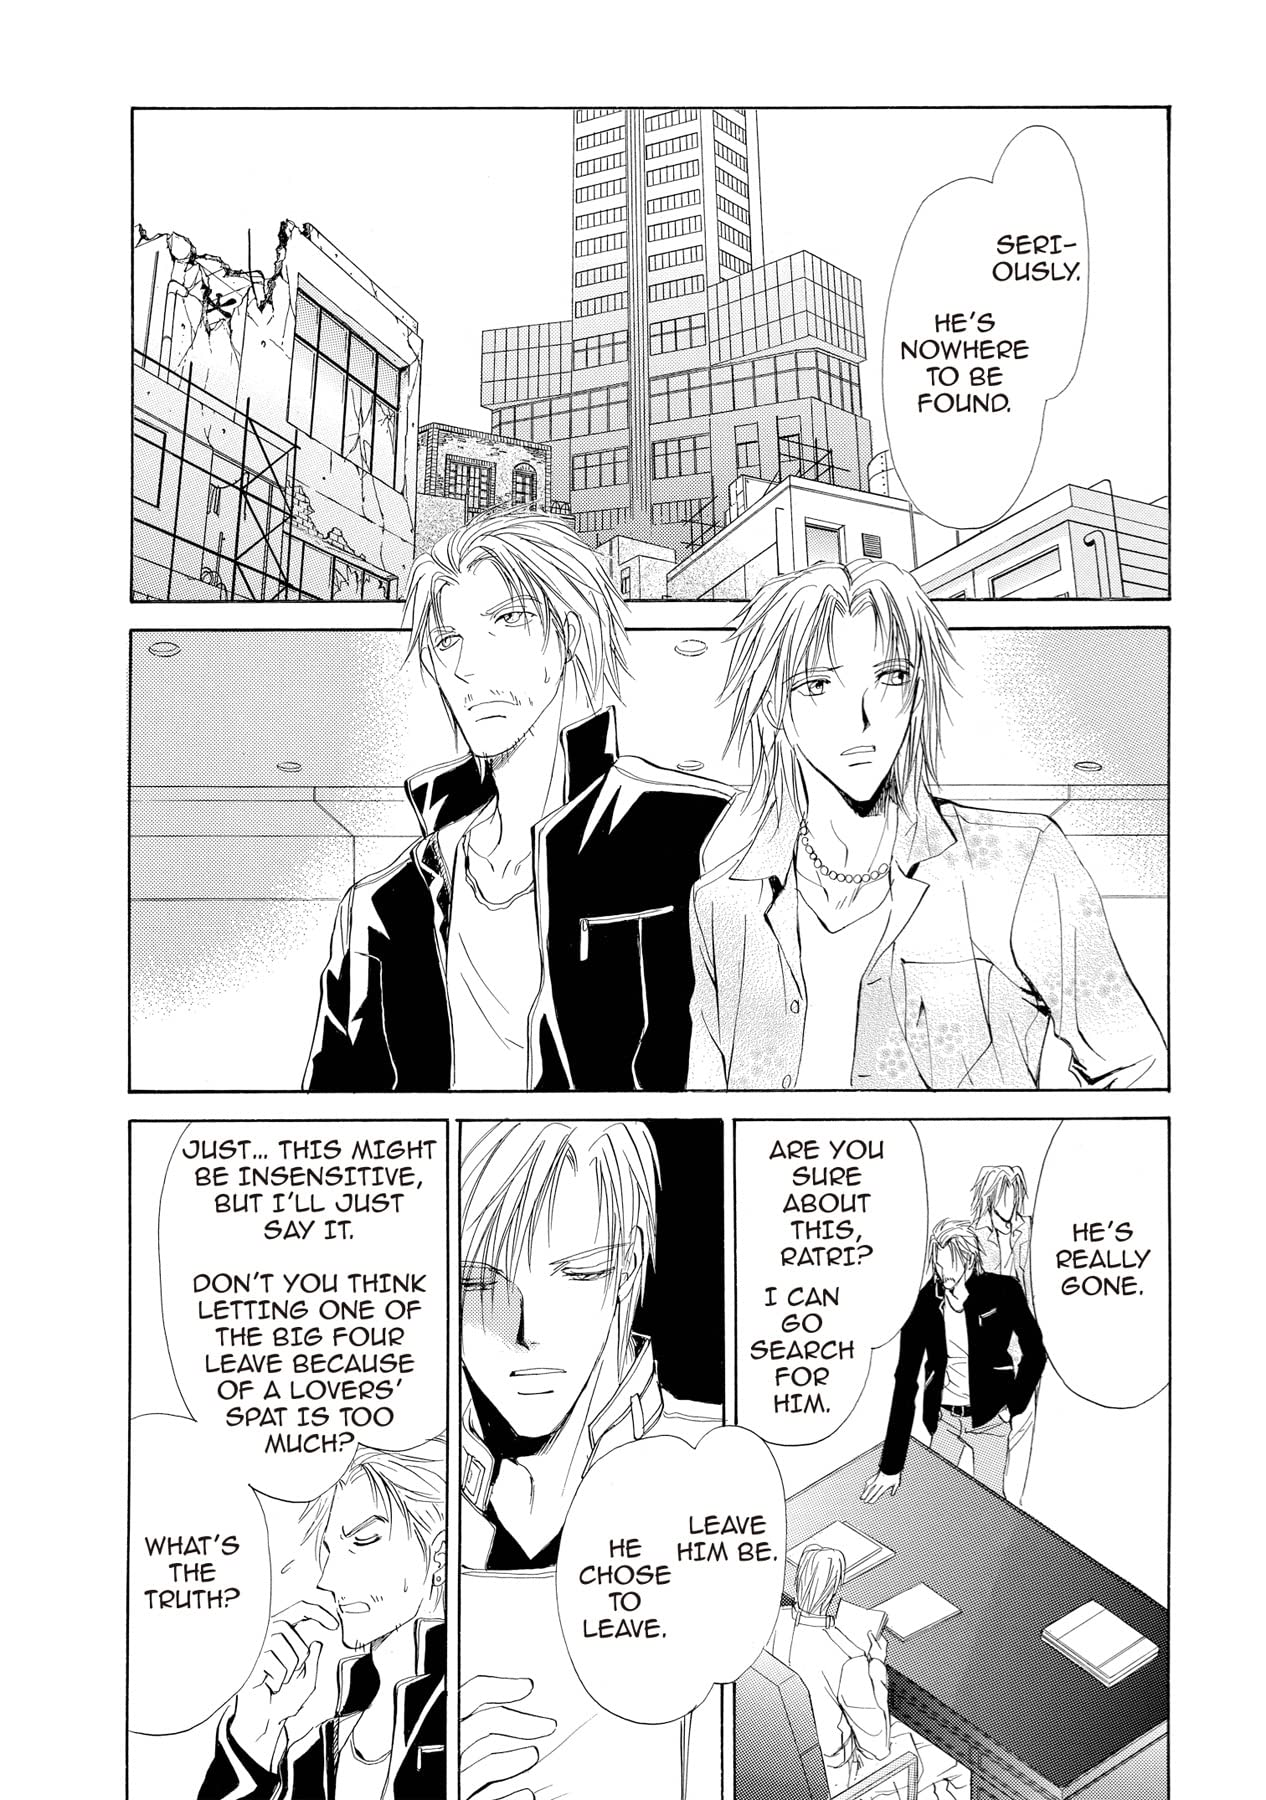 BLUE SHEEP'S REVERIE (Yaoi Manga) #11